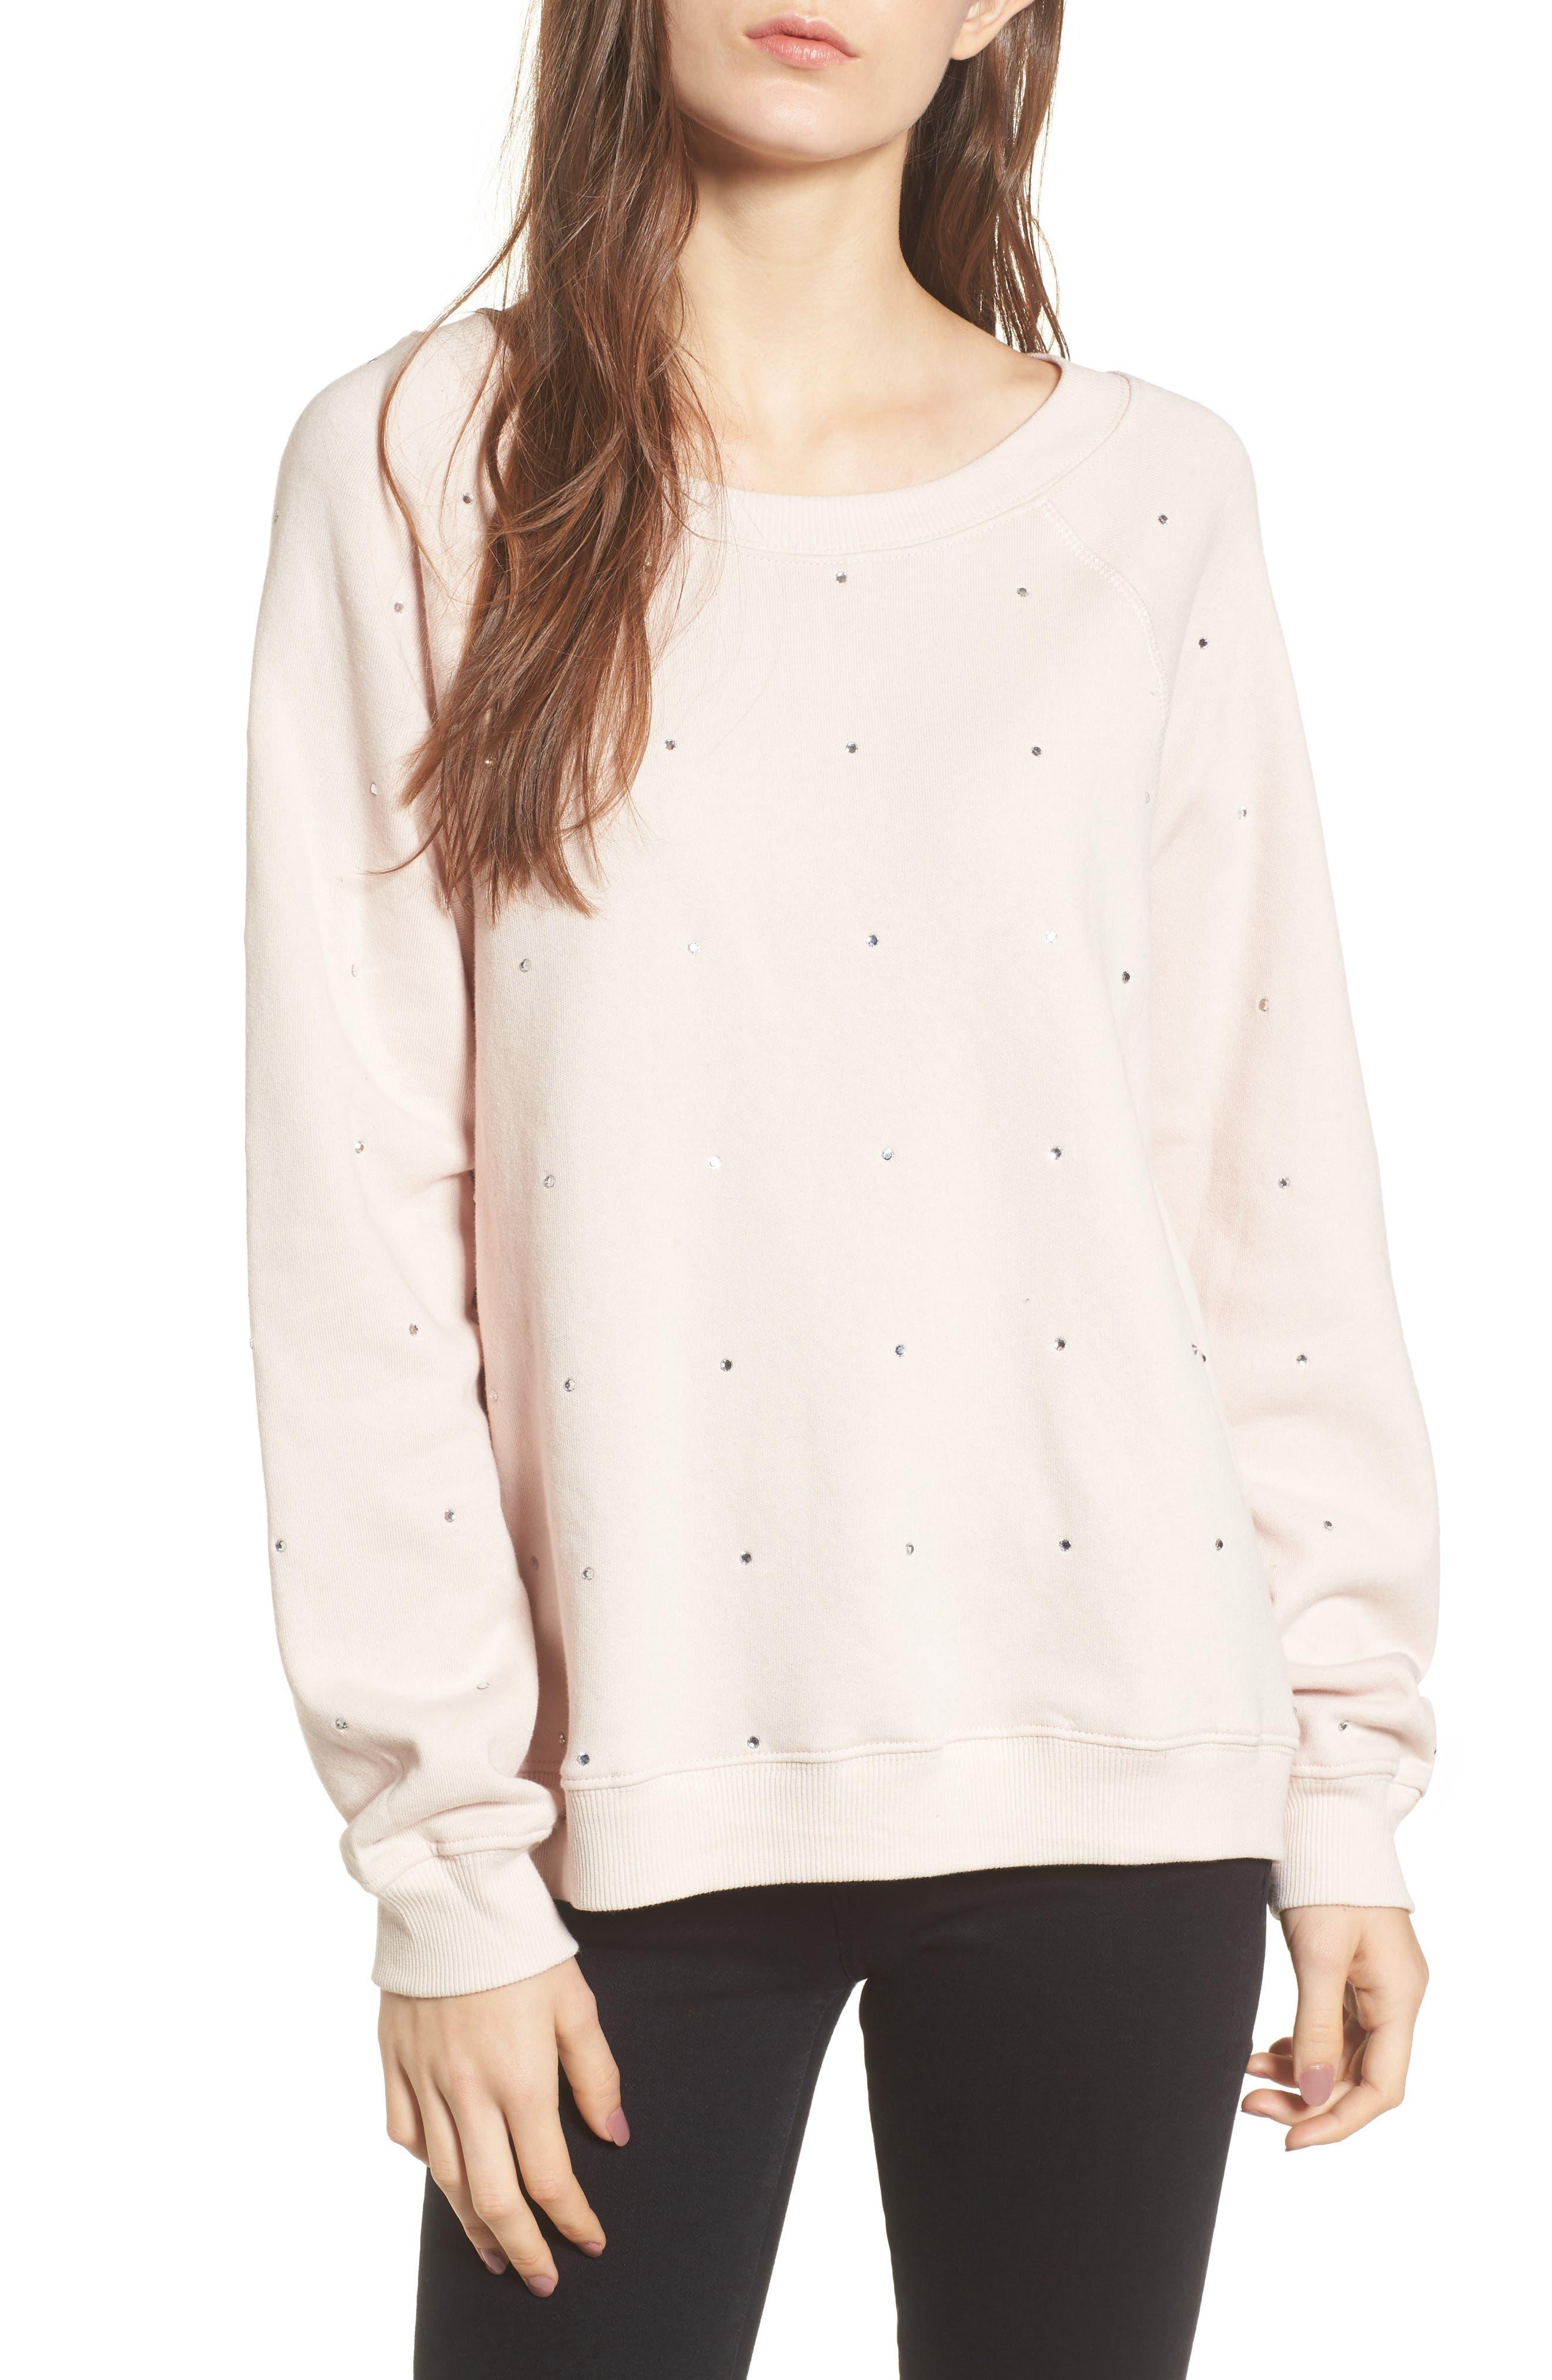 Glitz Sweatshirt,                             Main thumbnail 1, color,                             Iced Lavender